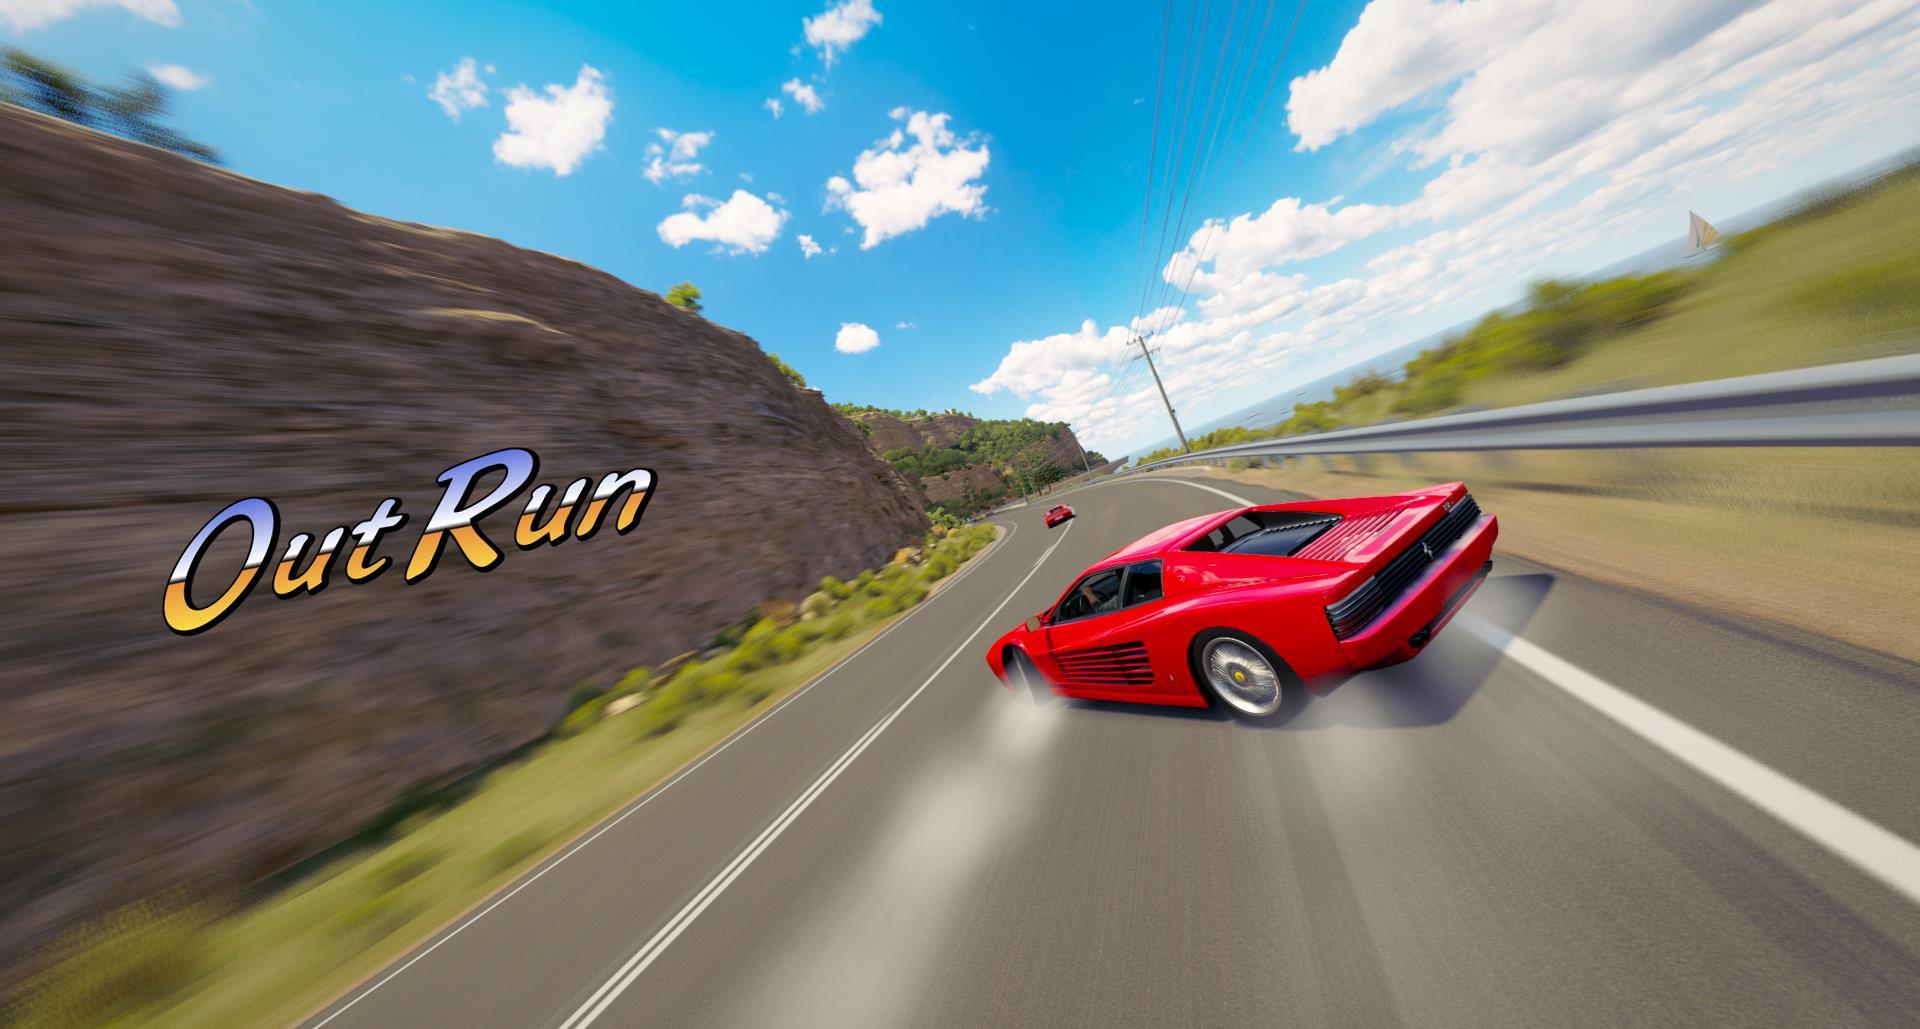 Artist pays tribute to racing franchises using Forza Horizon